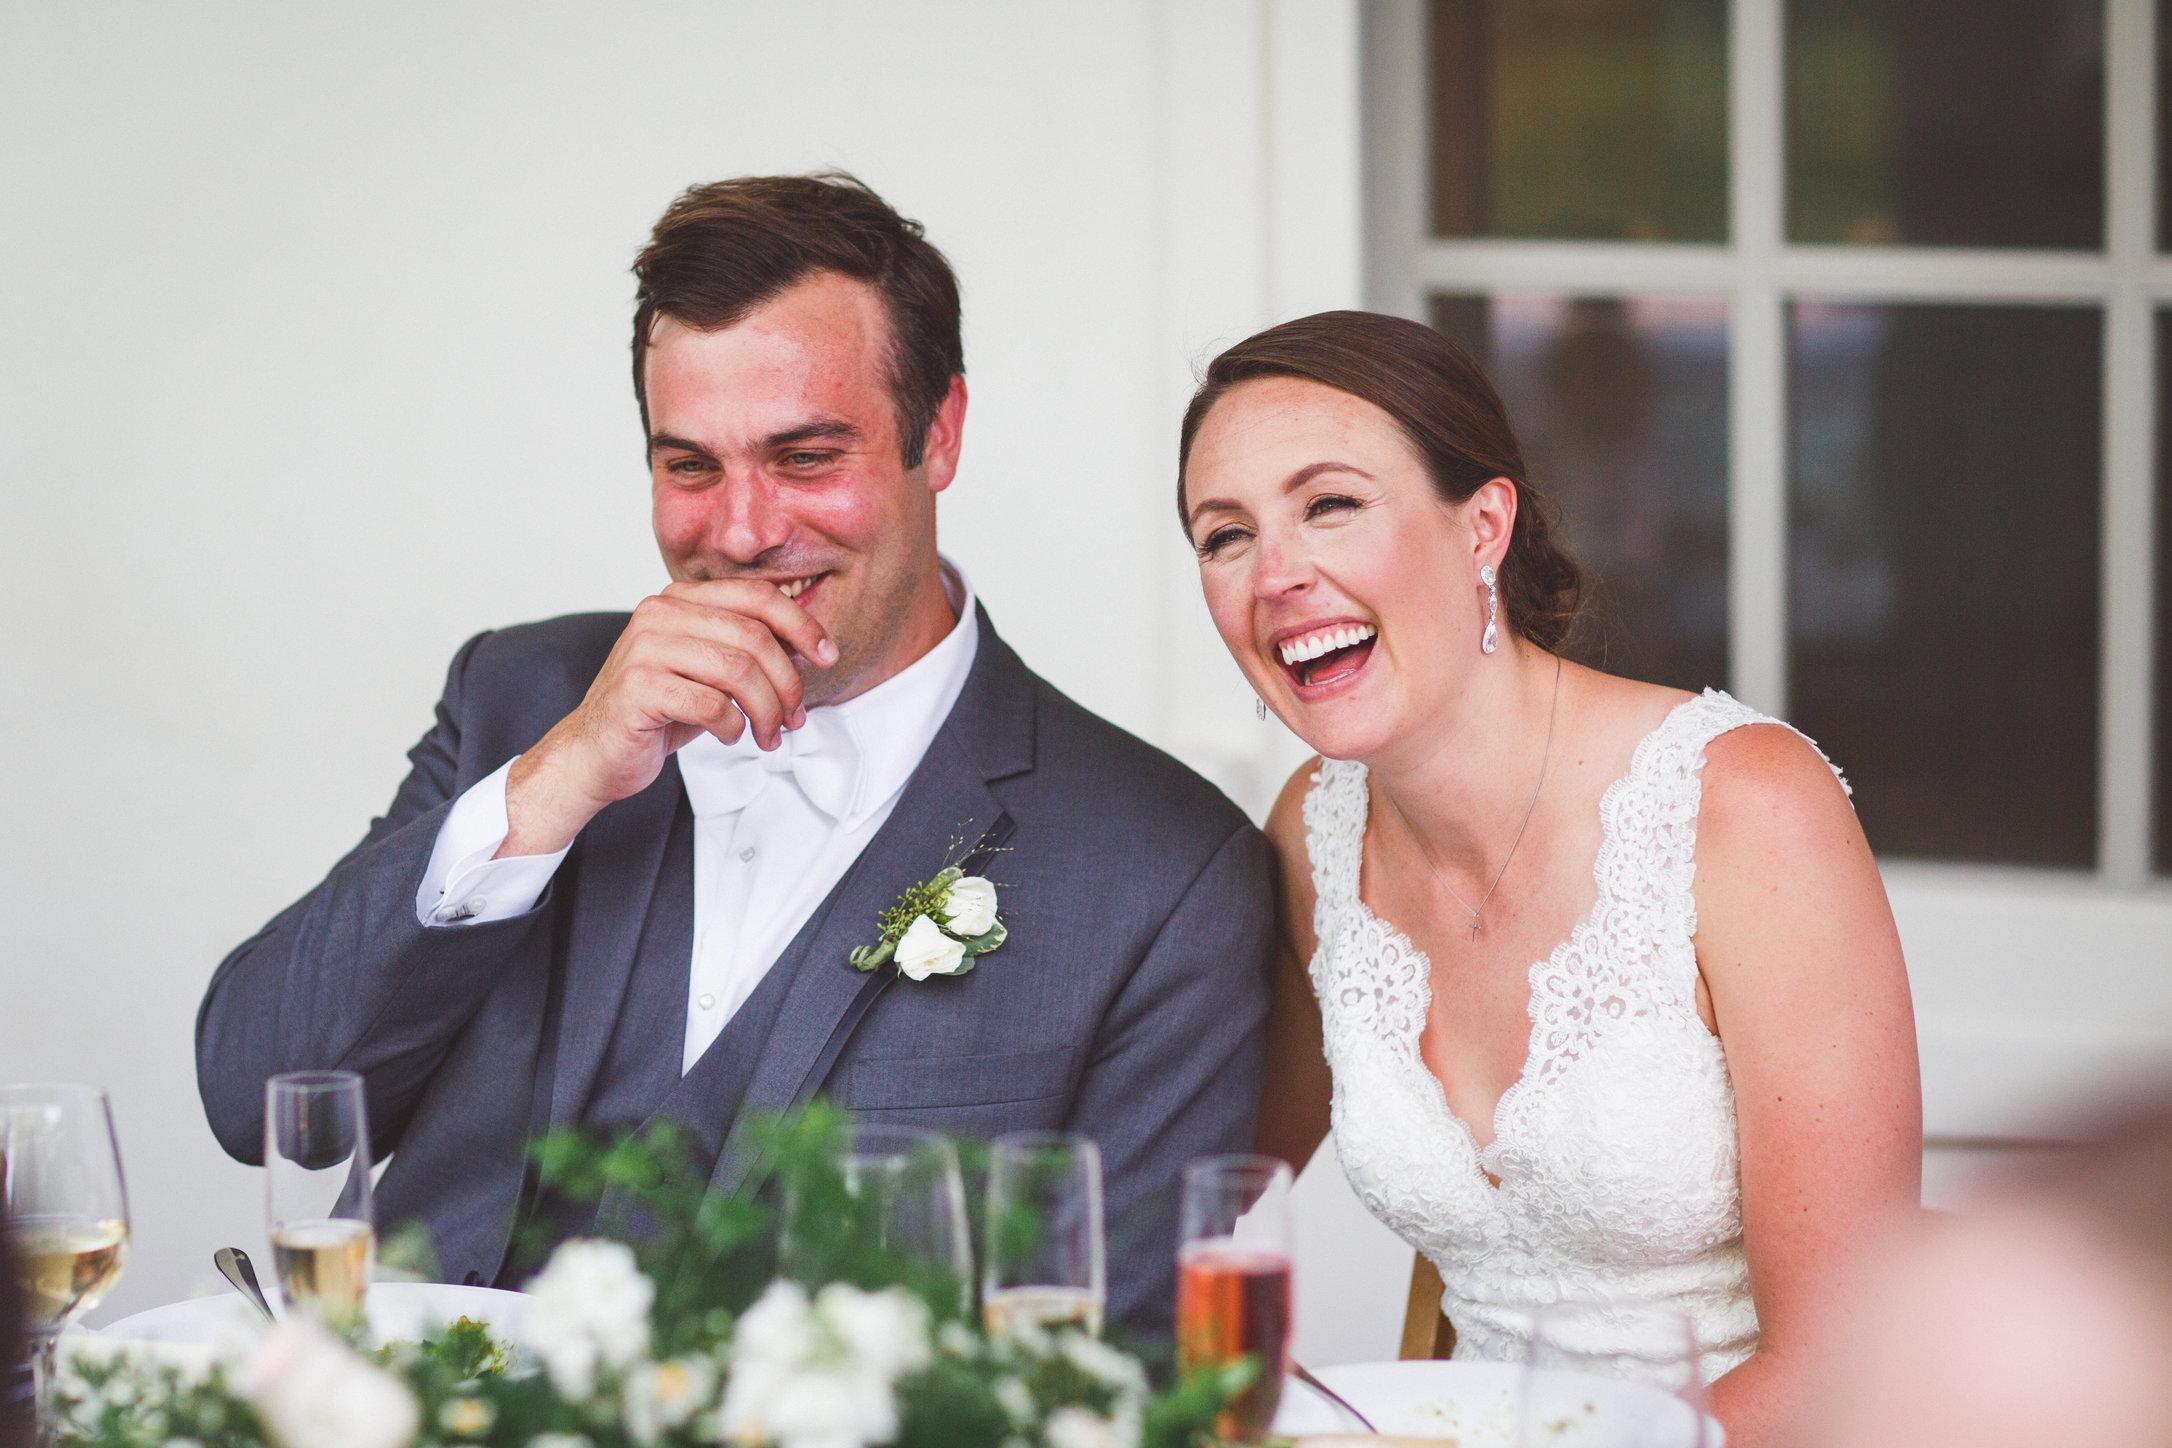 SandC-wedding-498.jpg